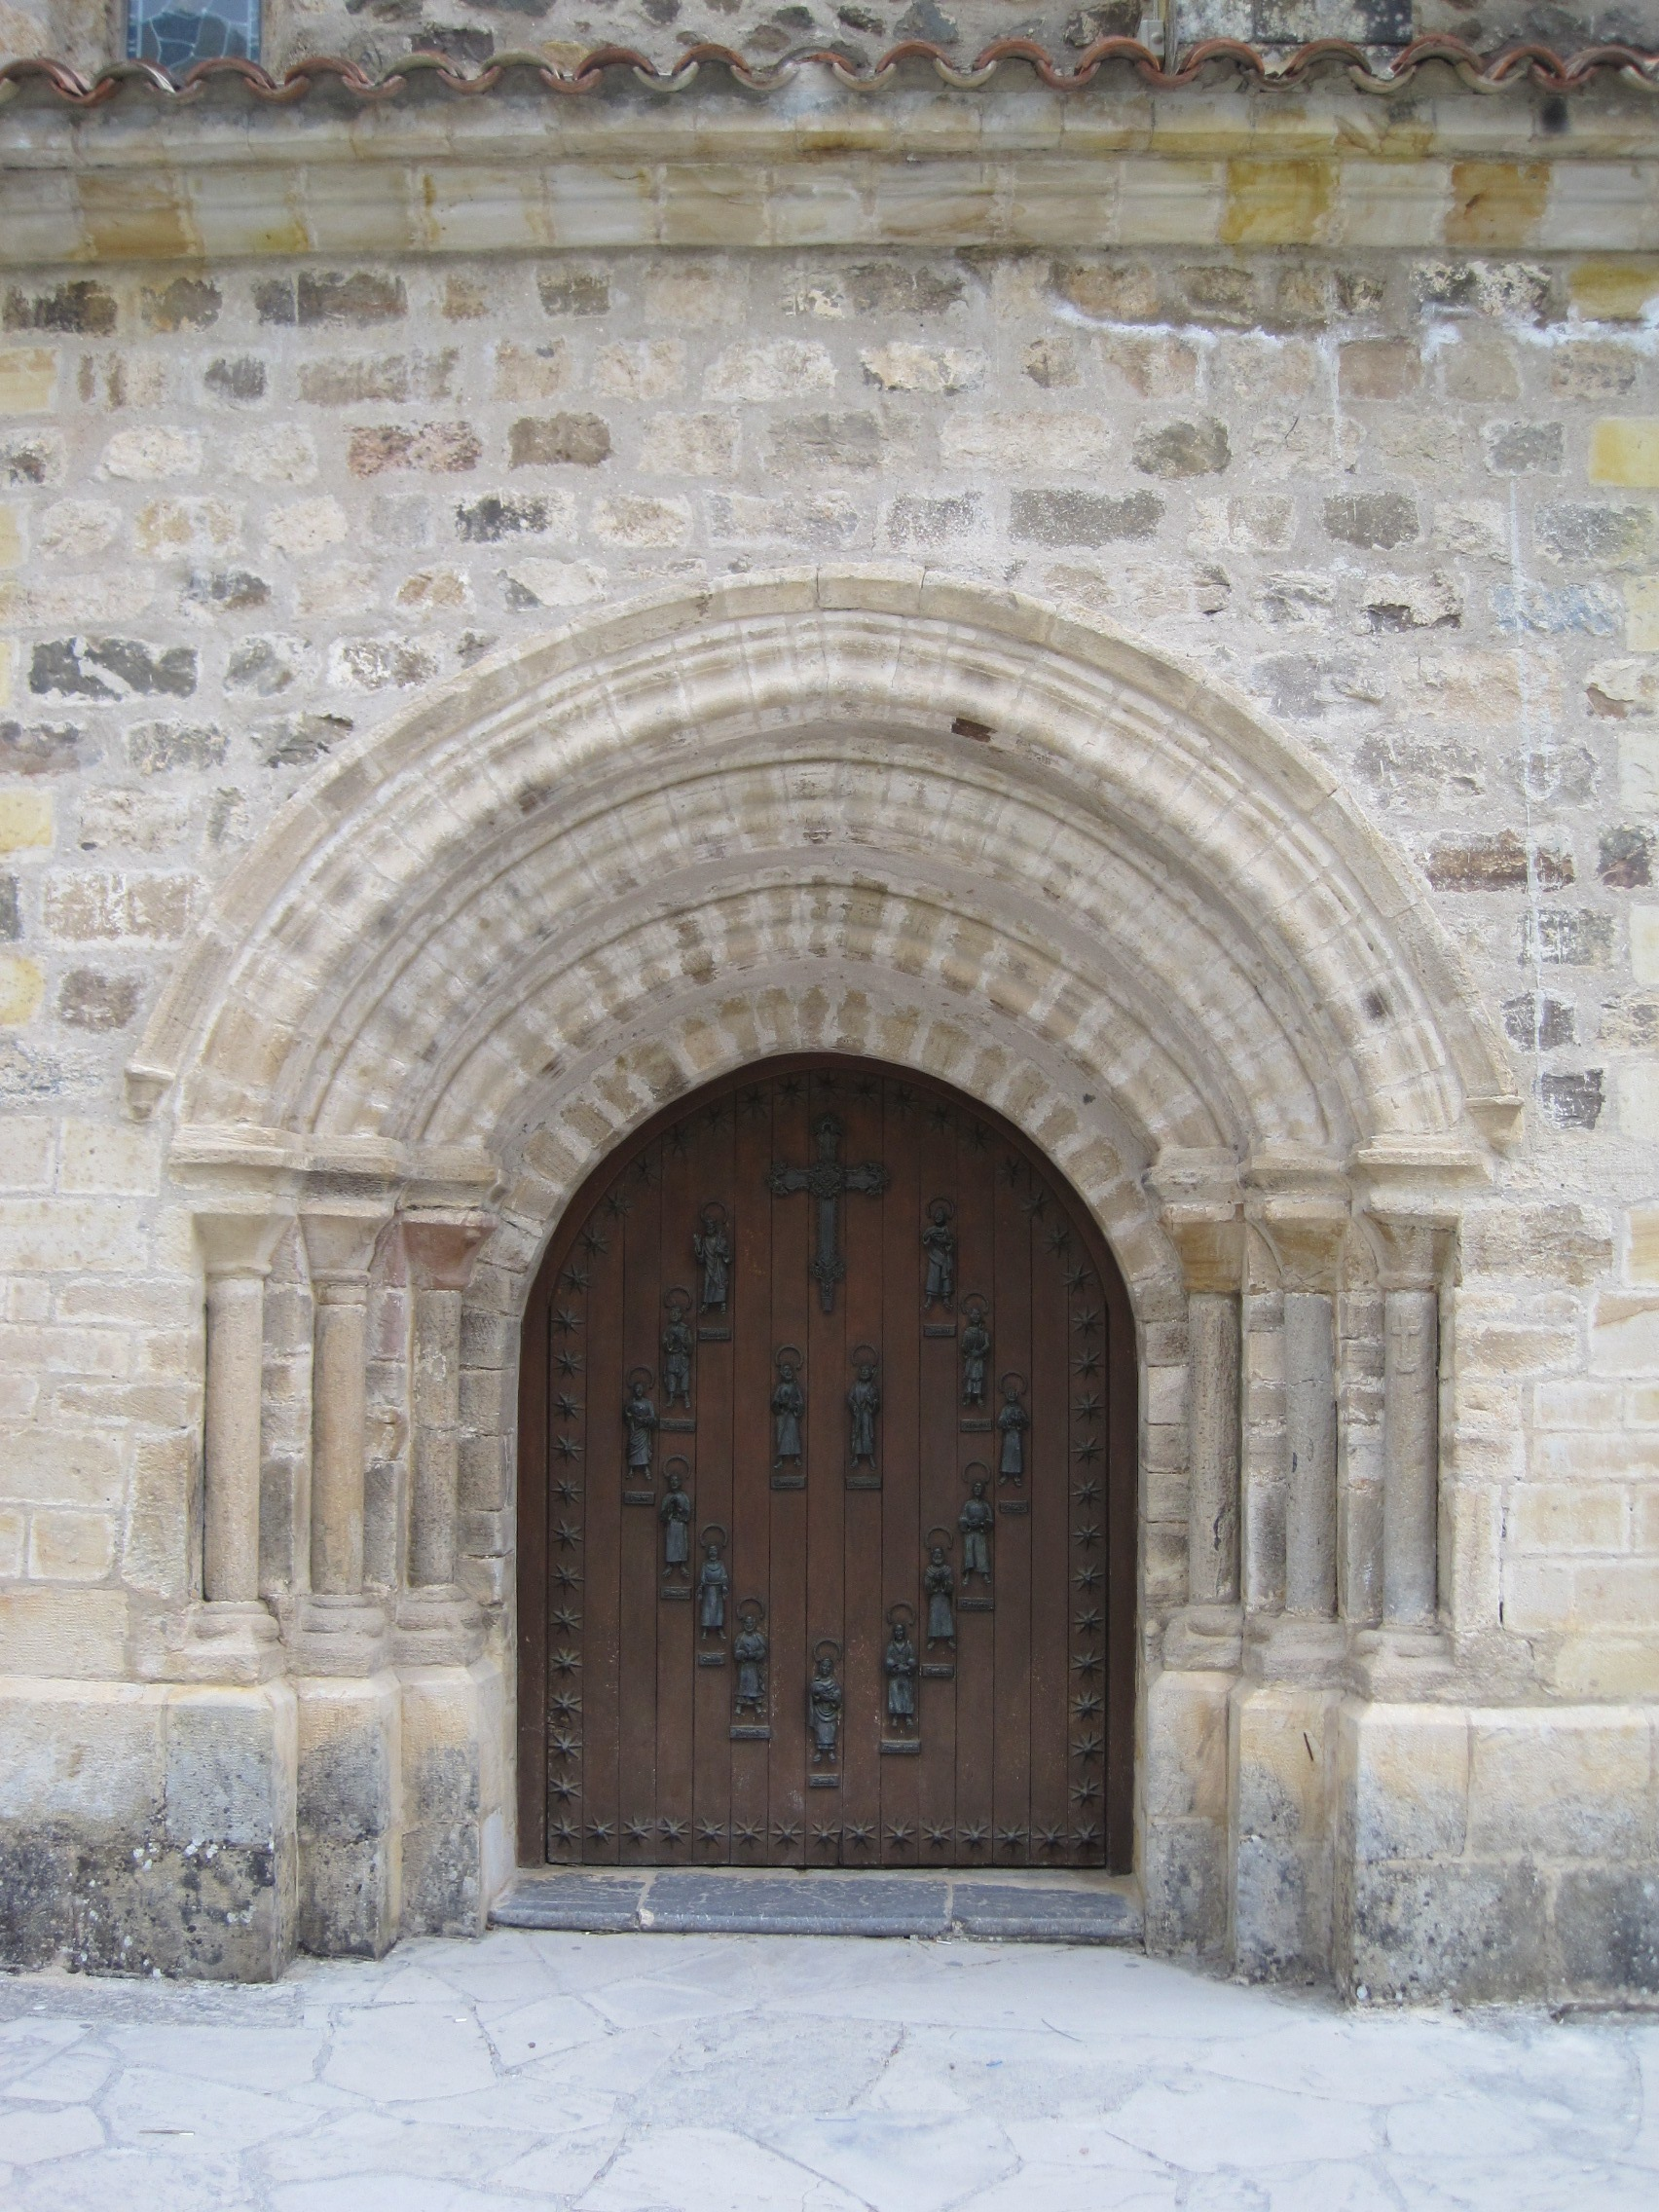 Archivo santo toribio puerta del perd wikipedia for Puerta 4 del jockey